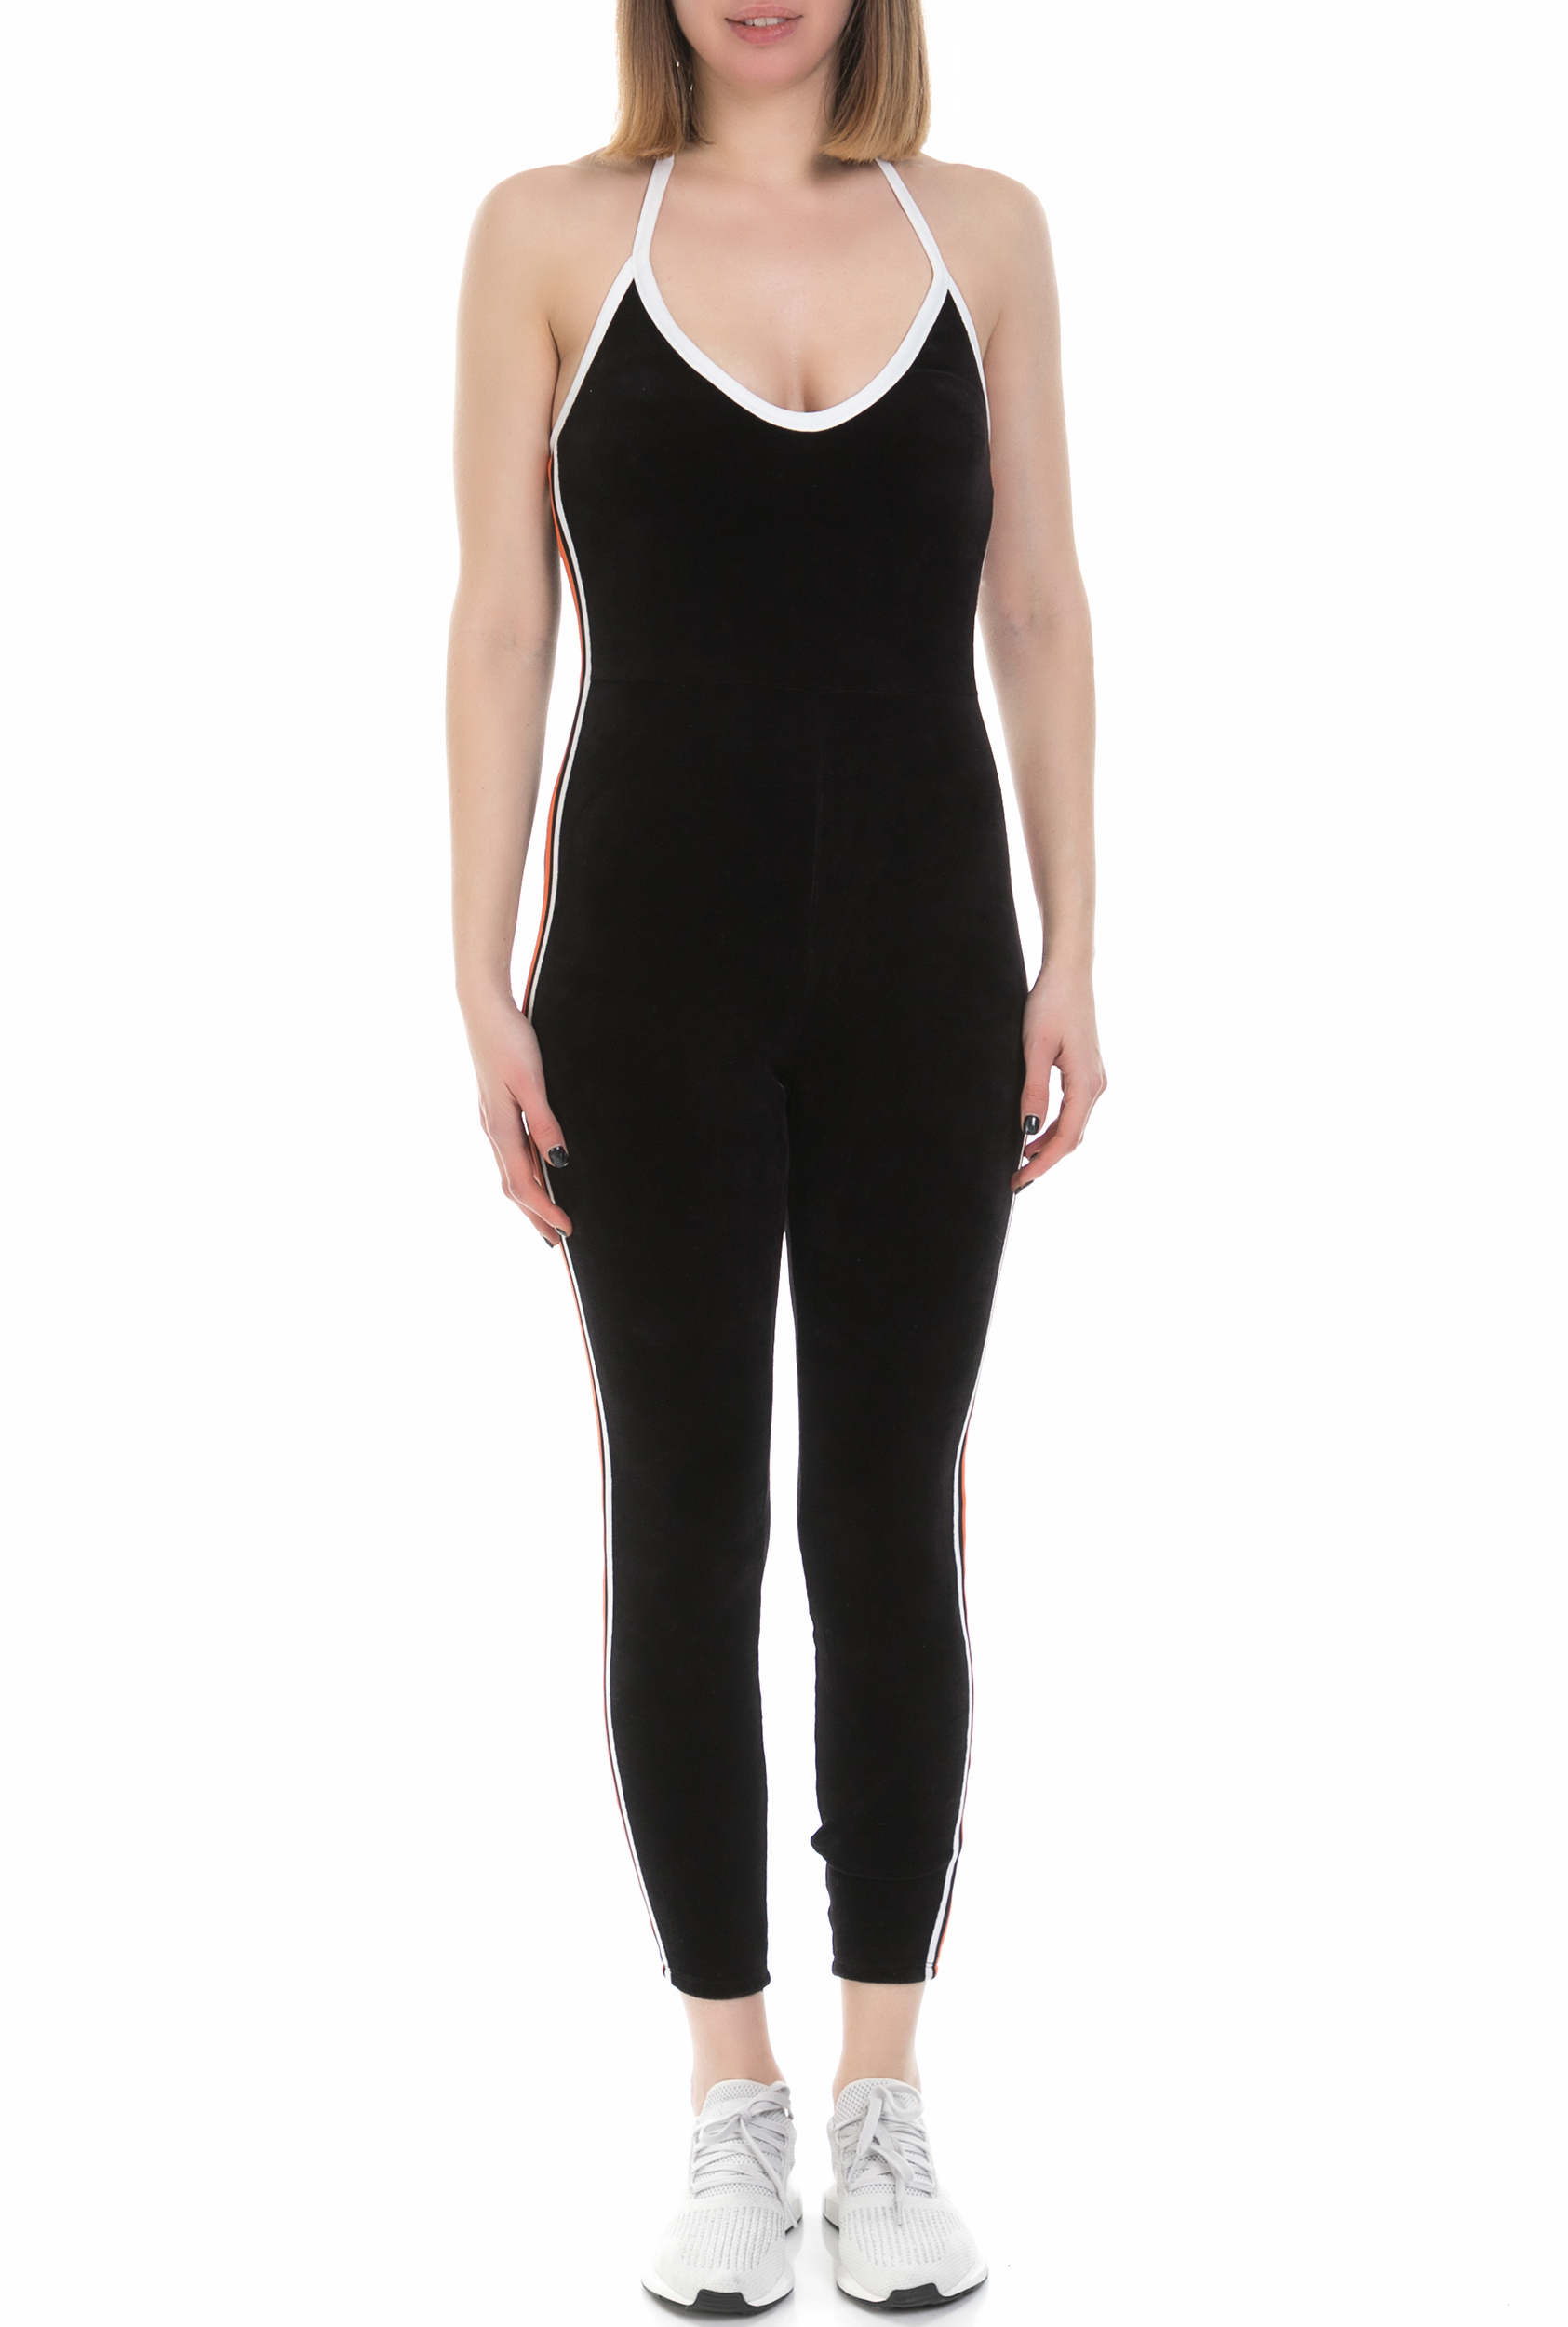 f25ea9ddd988 CollectiveOnline JUICY COUTURE - Γυναικεία ολόσωμη φόρμα Juicy Couture μαύρη